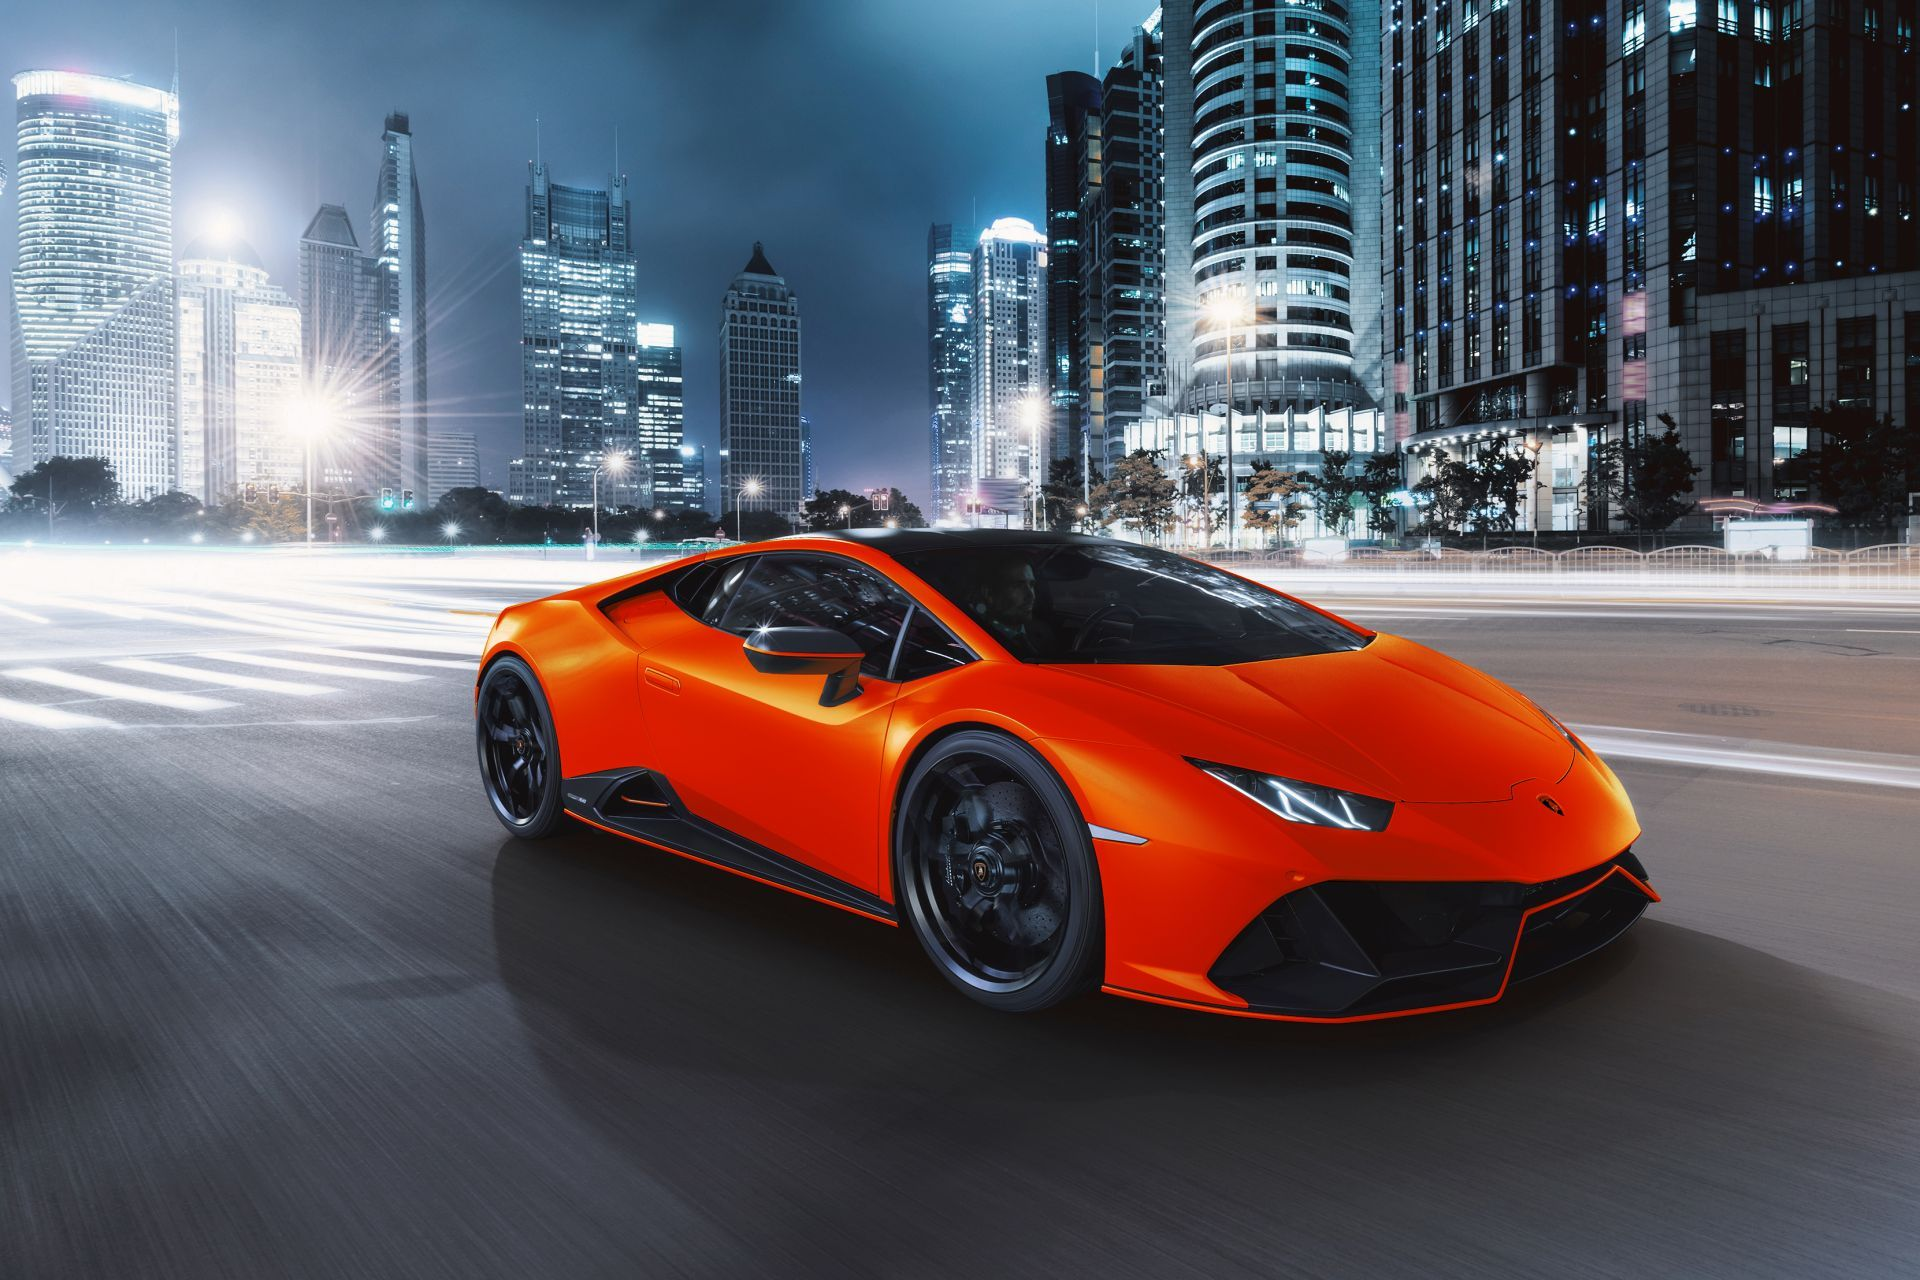 Lamborghini-Huracan-Evo-Fluo-Capsule-12